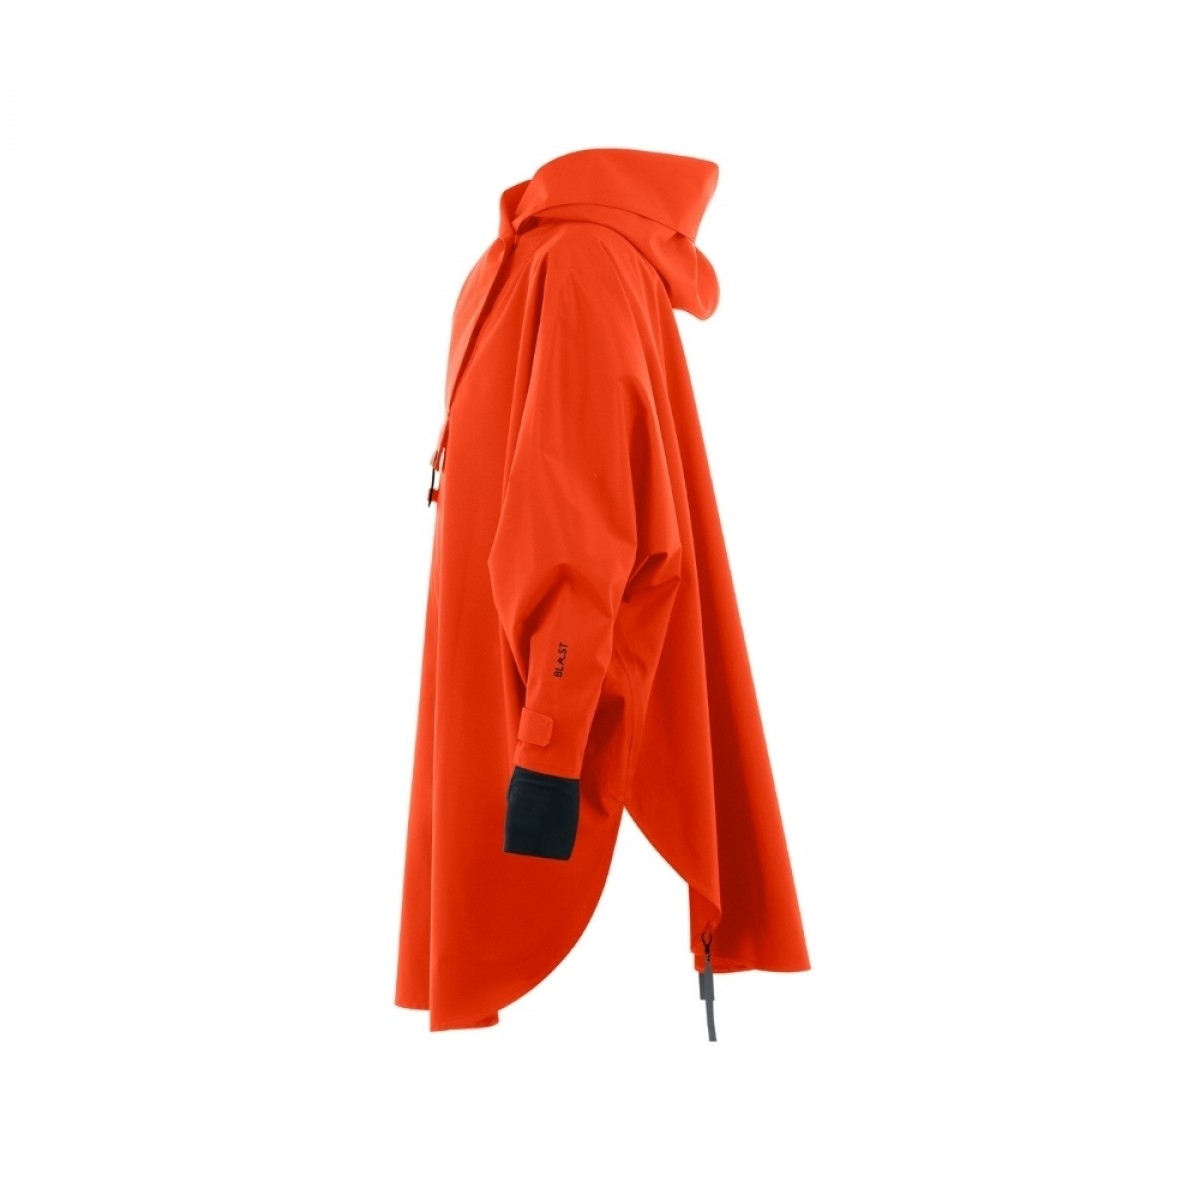 bergen regn poncho orange - siden